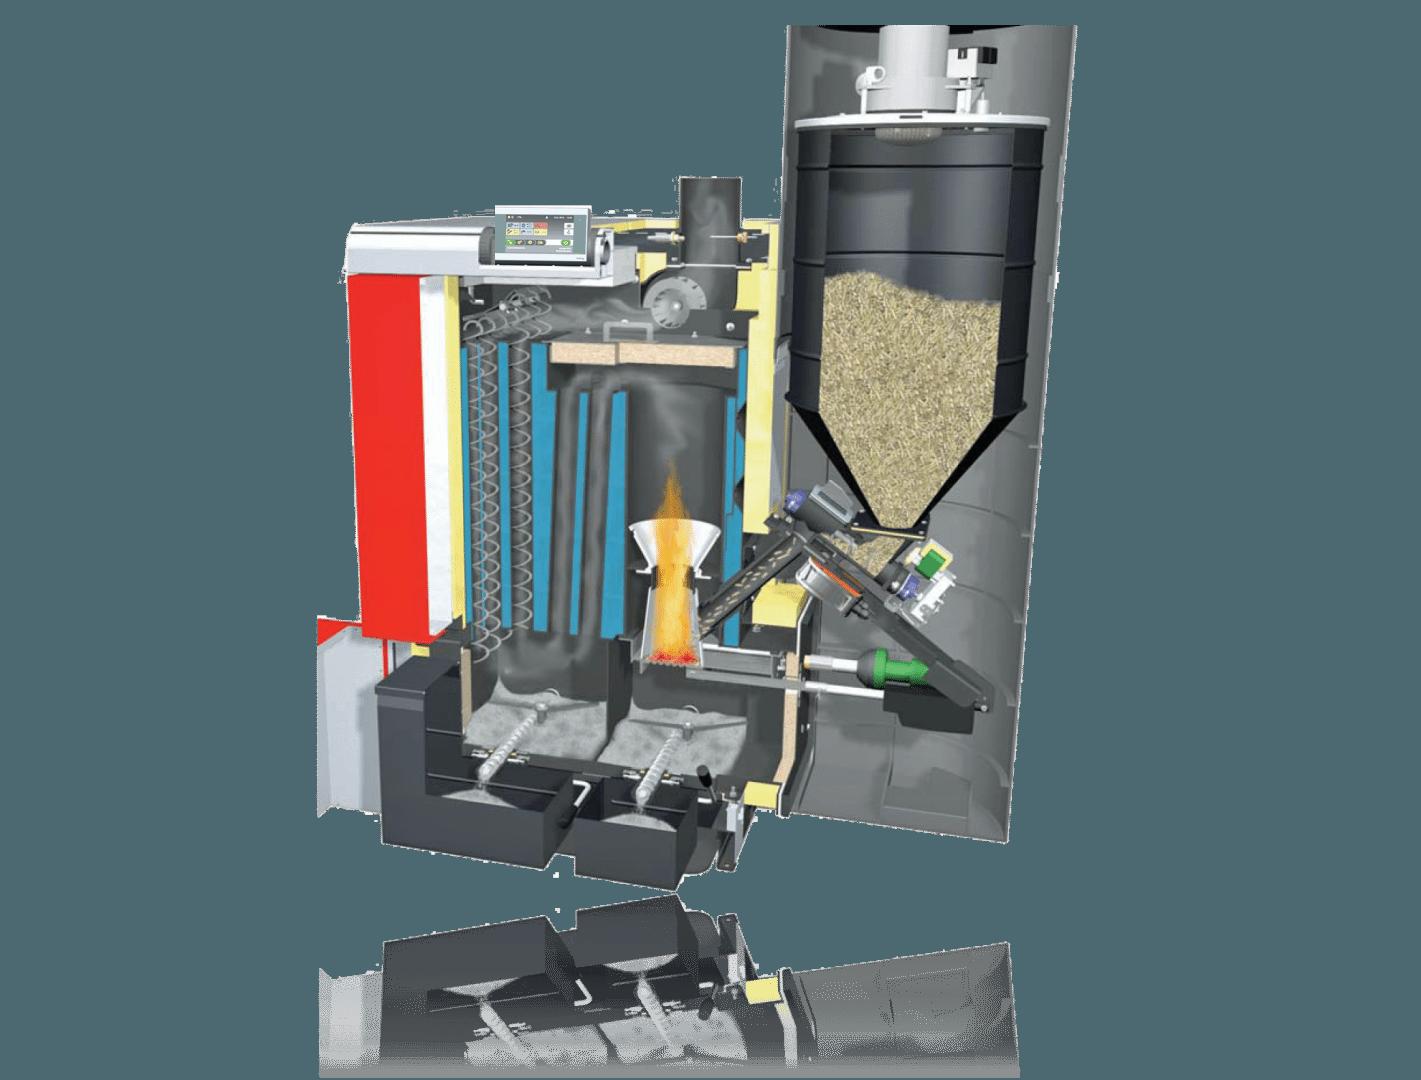 P4 Wood Pellet Boiler by Fröling - Fully Automatic EPA ...